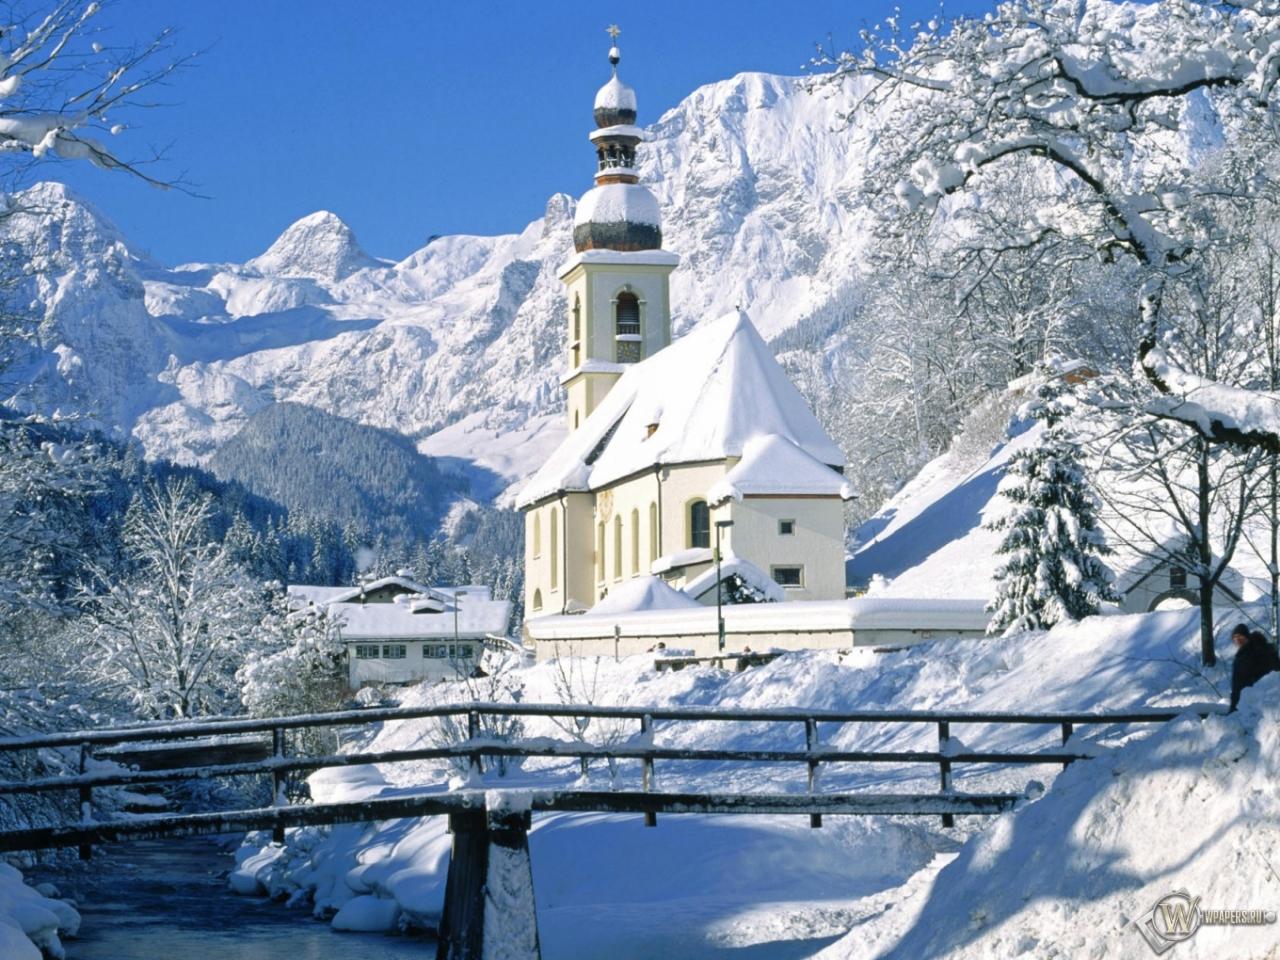 Горы снег часовня 1280x960 картинки